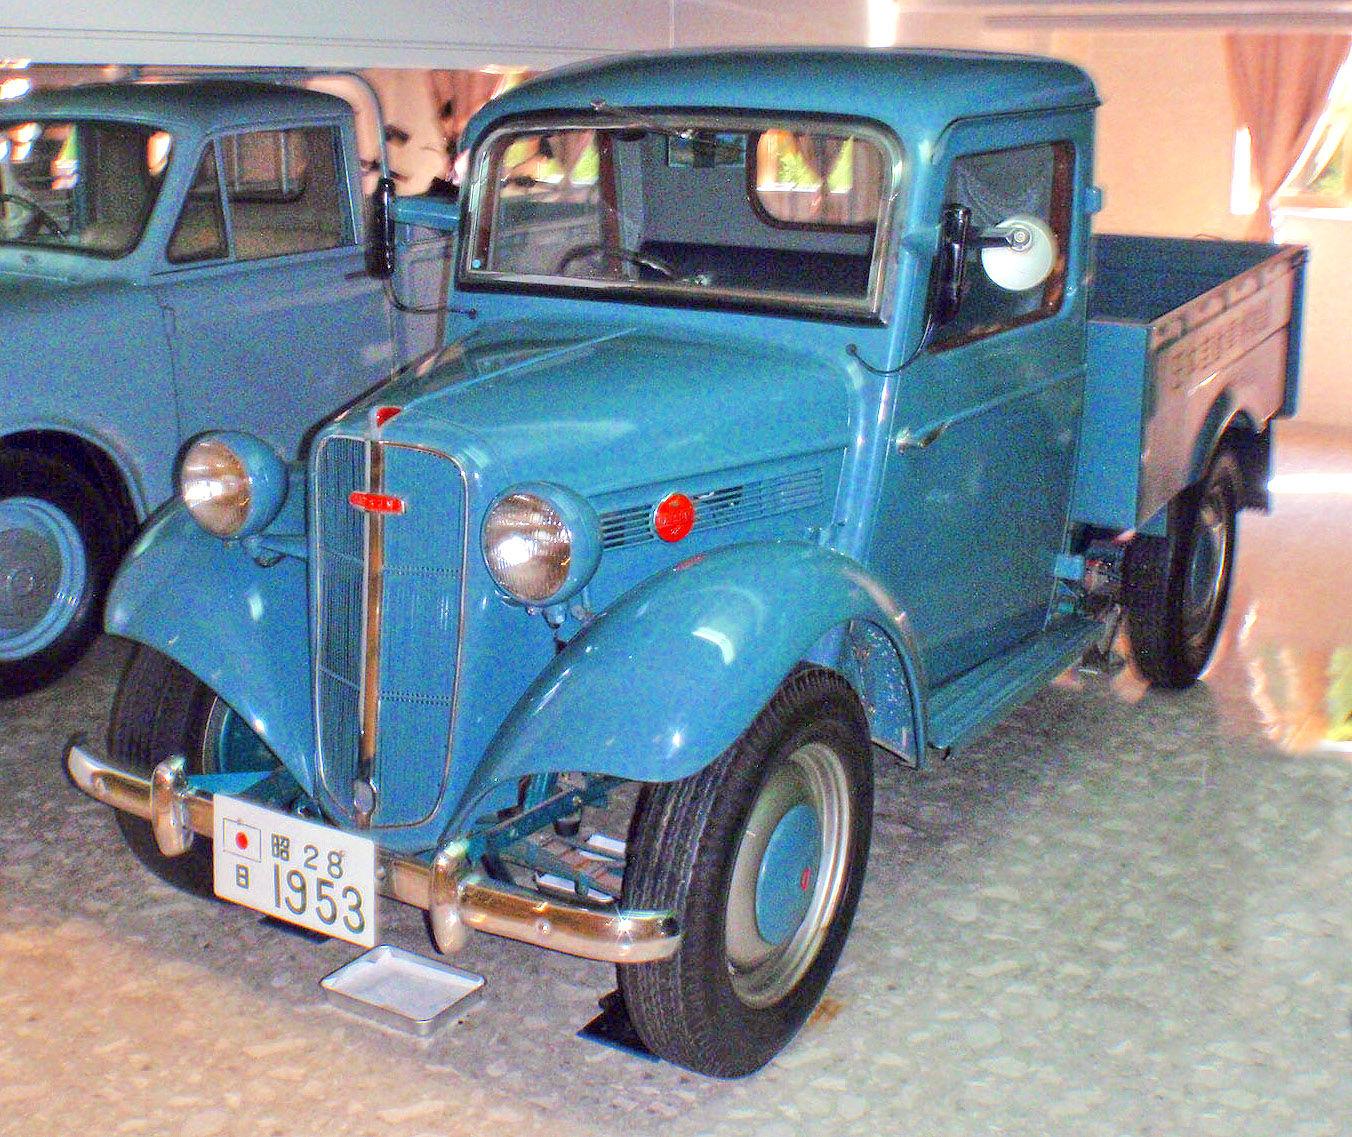 File:1953 Datsun 6147 Truck.jpg